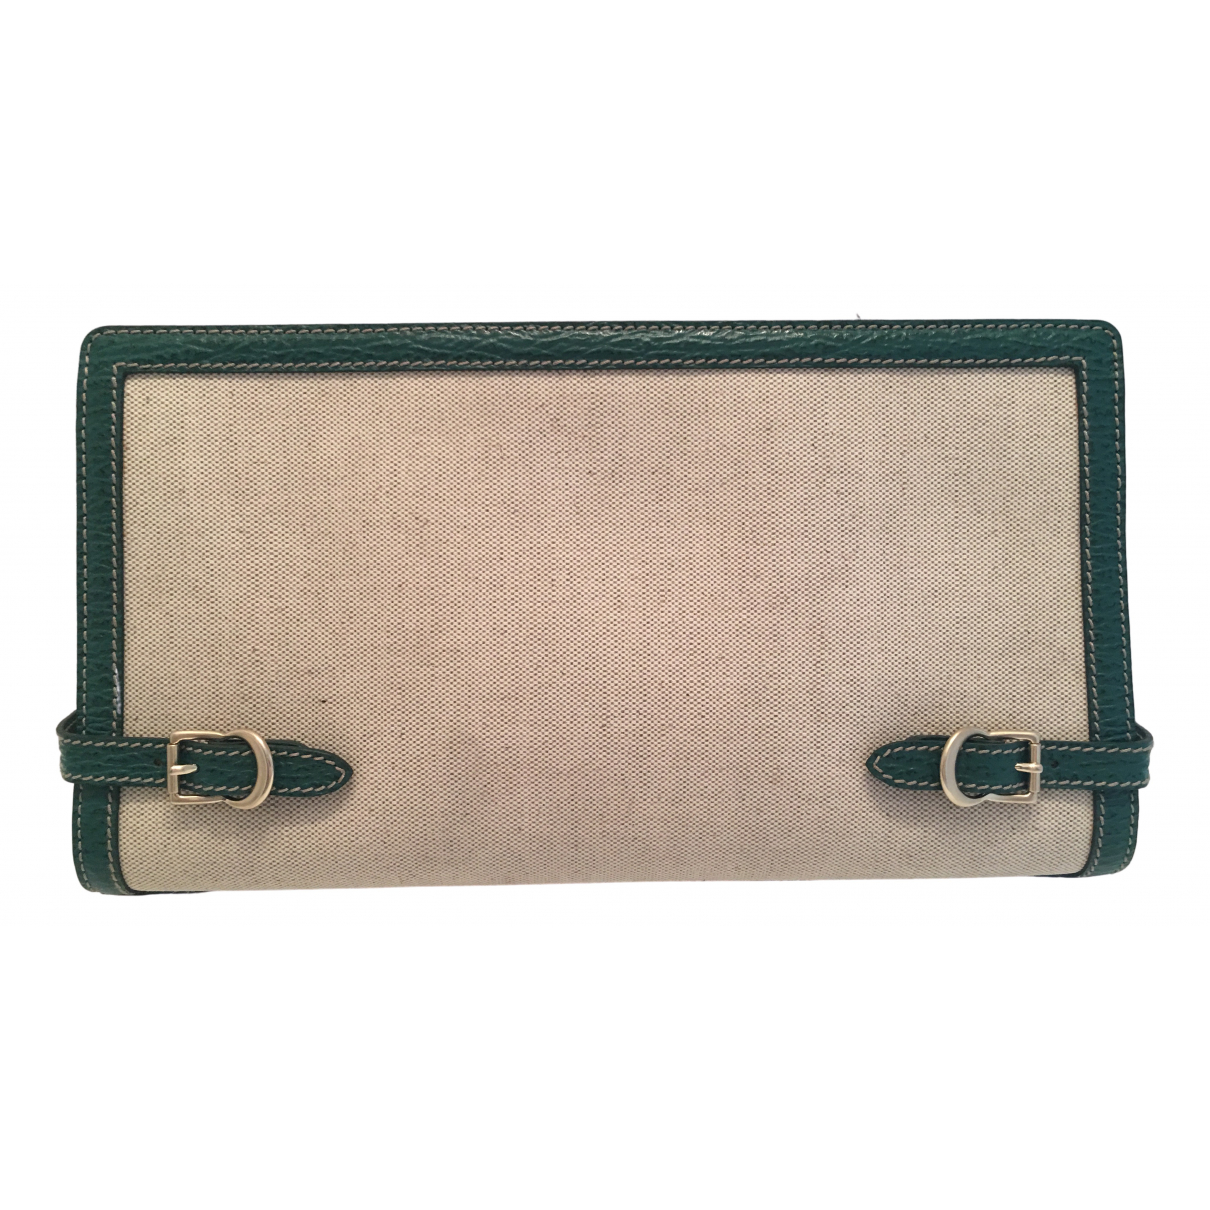 Bally - Pochette   pour femme en cuir - vert